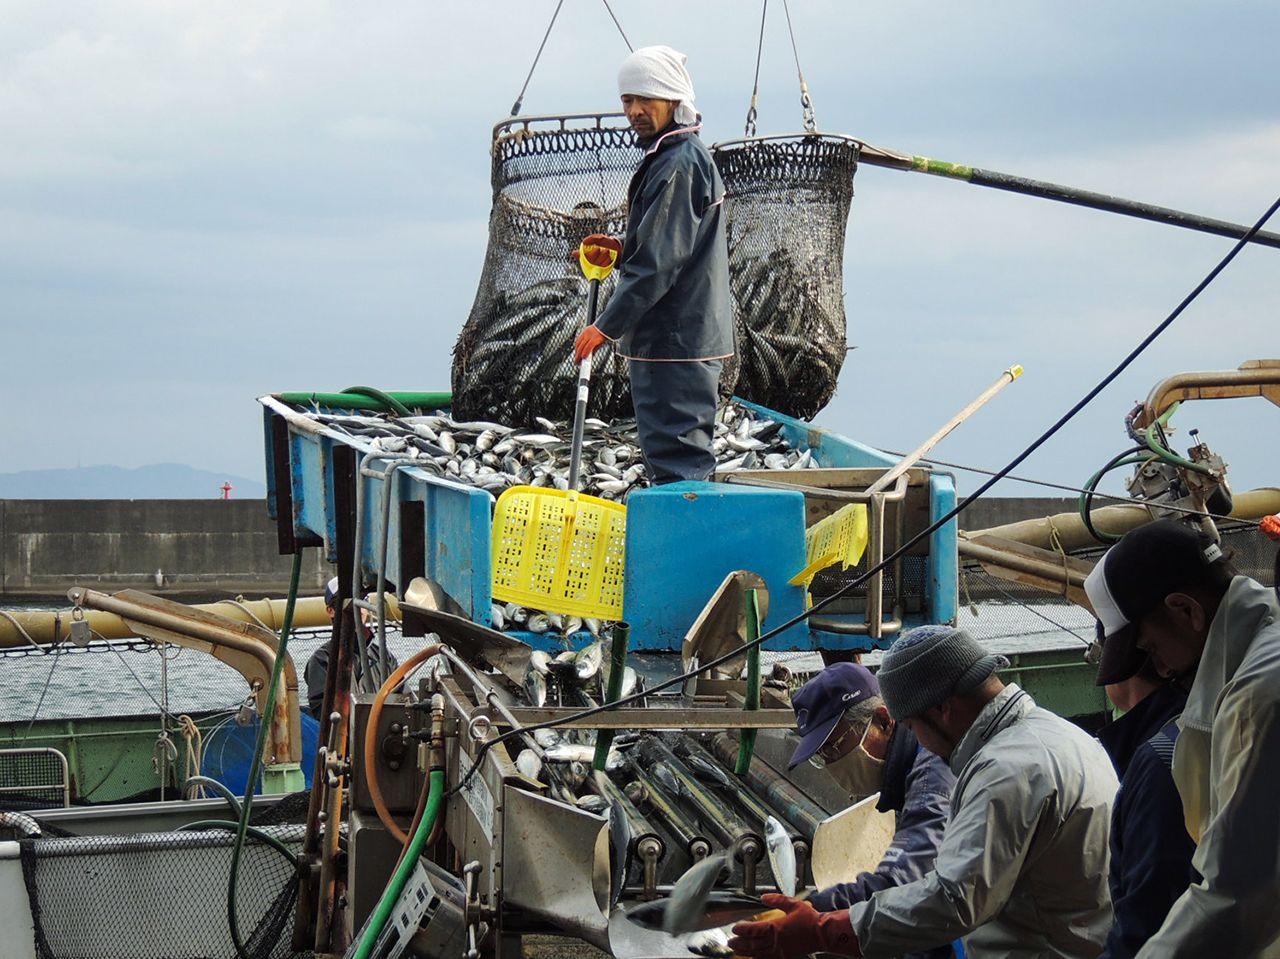 Mackerel diturunkan di Pelabuhan Ogawa.